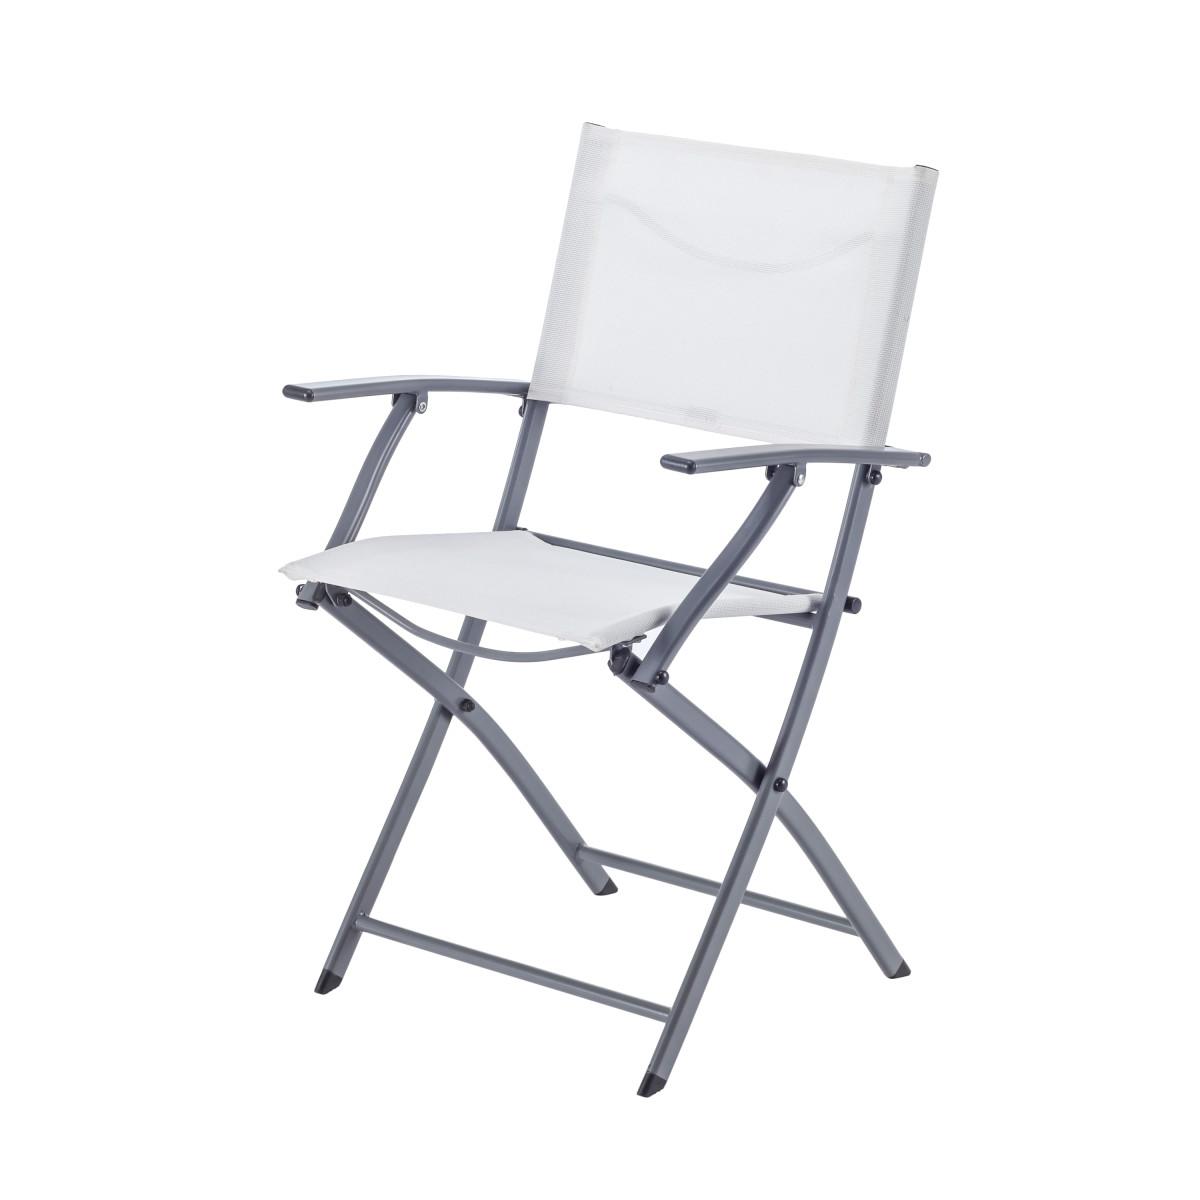 Кресло Naterial Emys Origami складное 54х52х83 см сталь белый